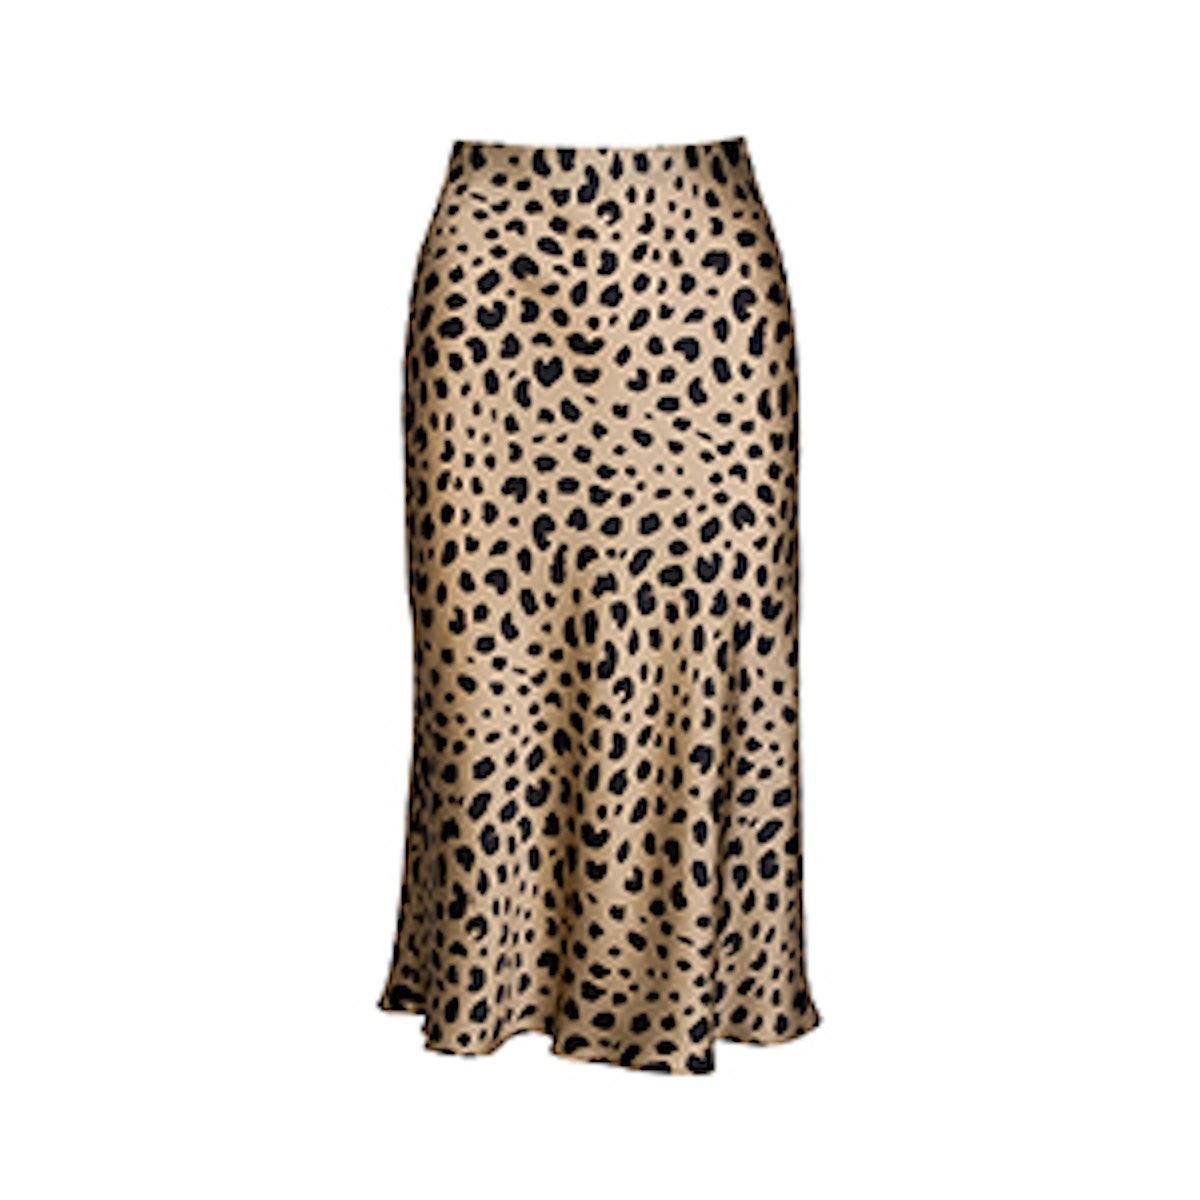 The Naomi Wild Things Skirt